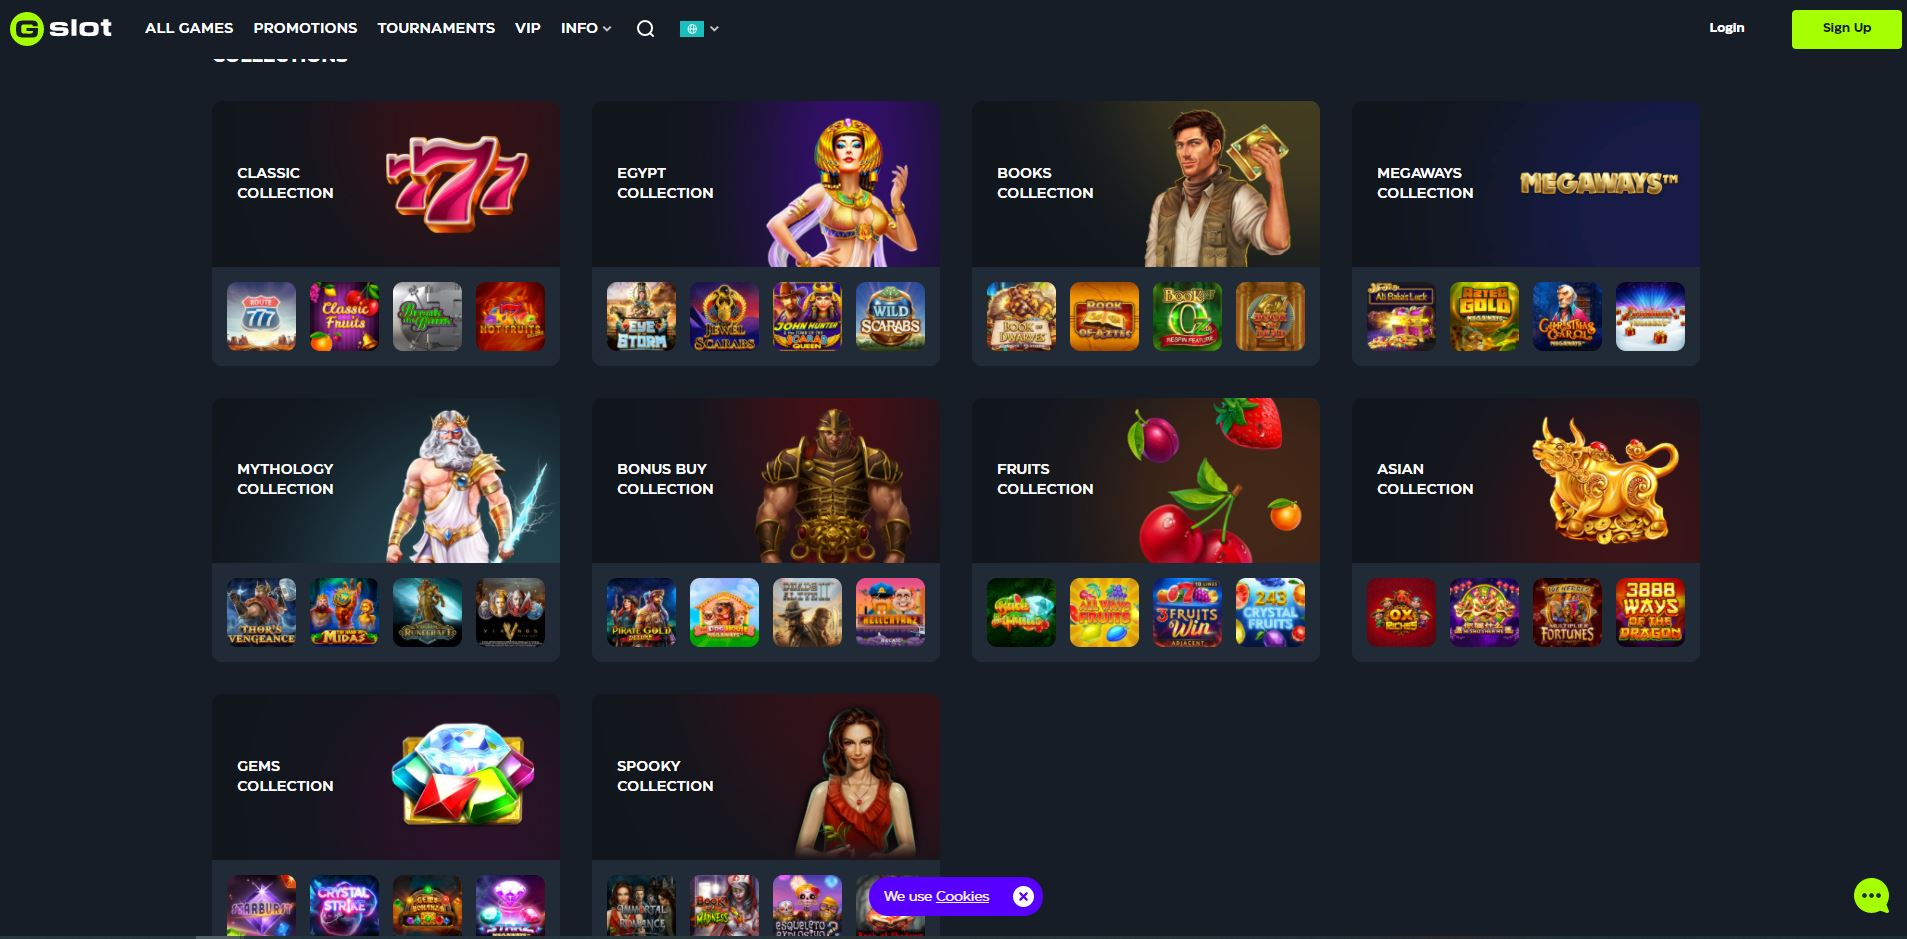 Gslot Casino Collection Screenshot